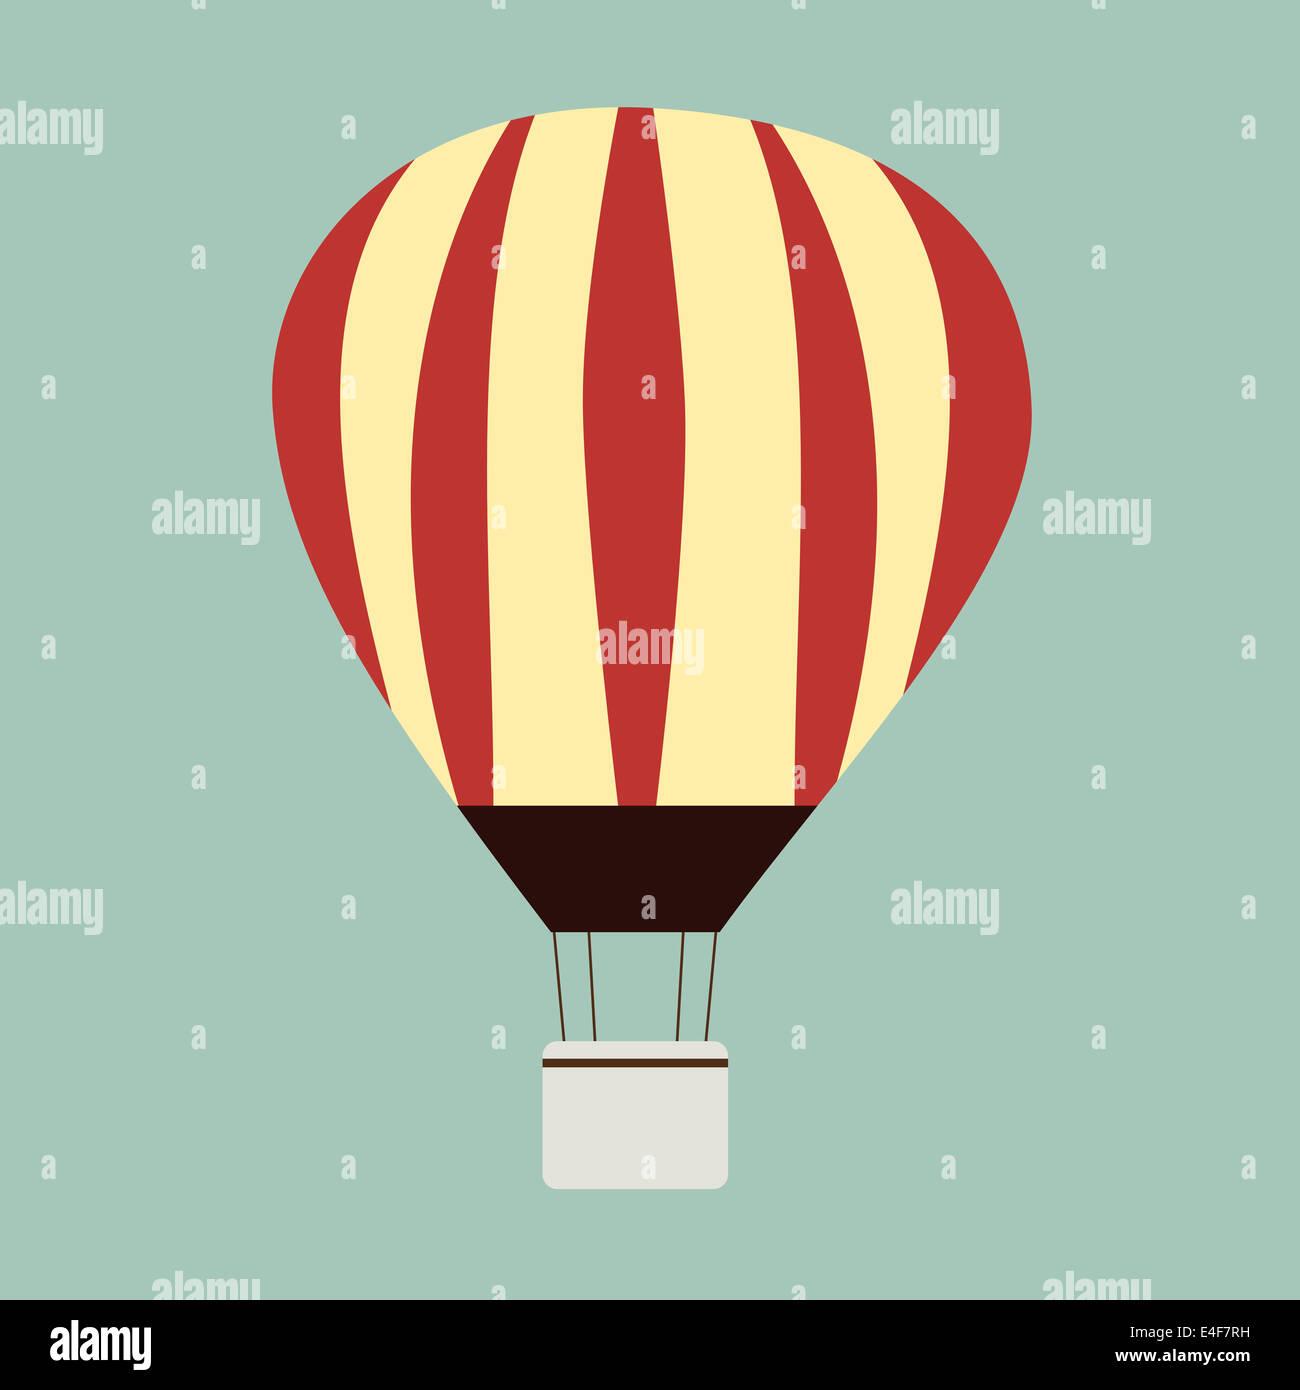 Hot Air Balloon Print Stock Photos Hot Air Balloon Print Stock